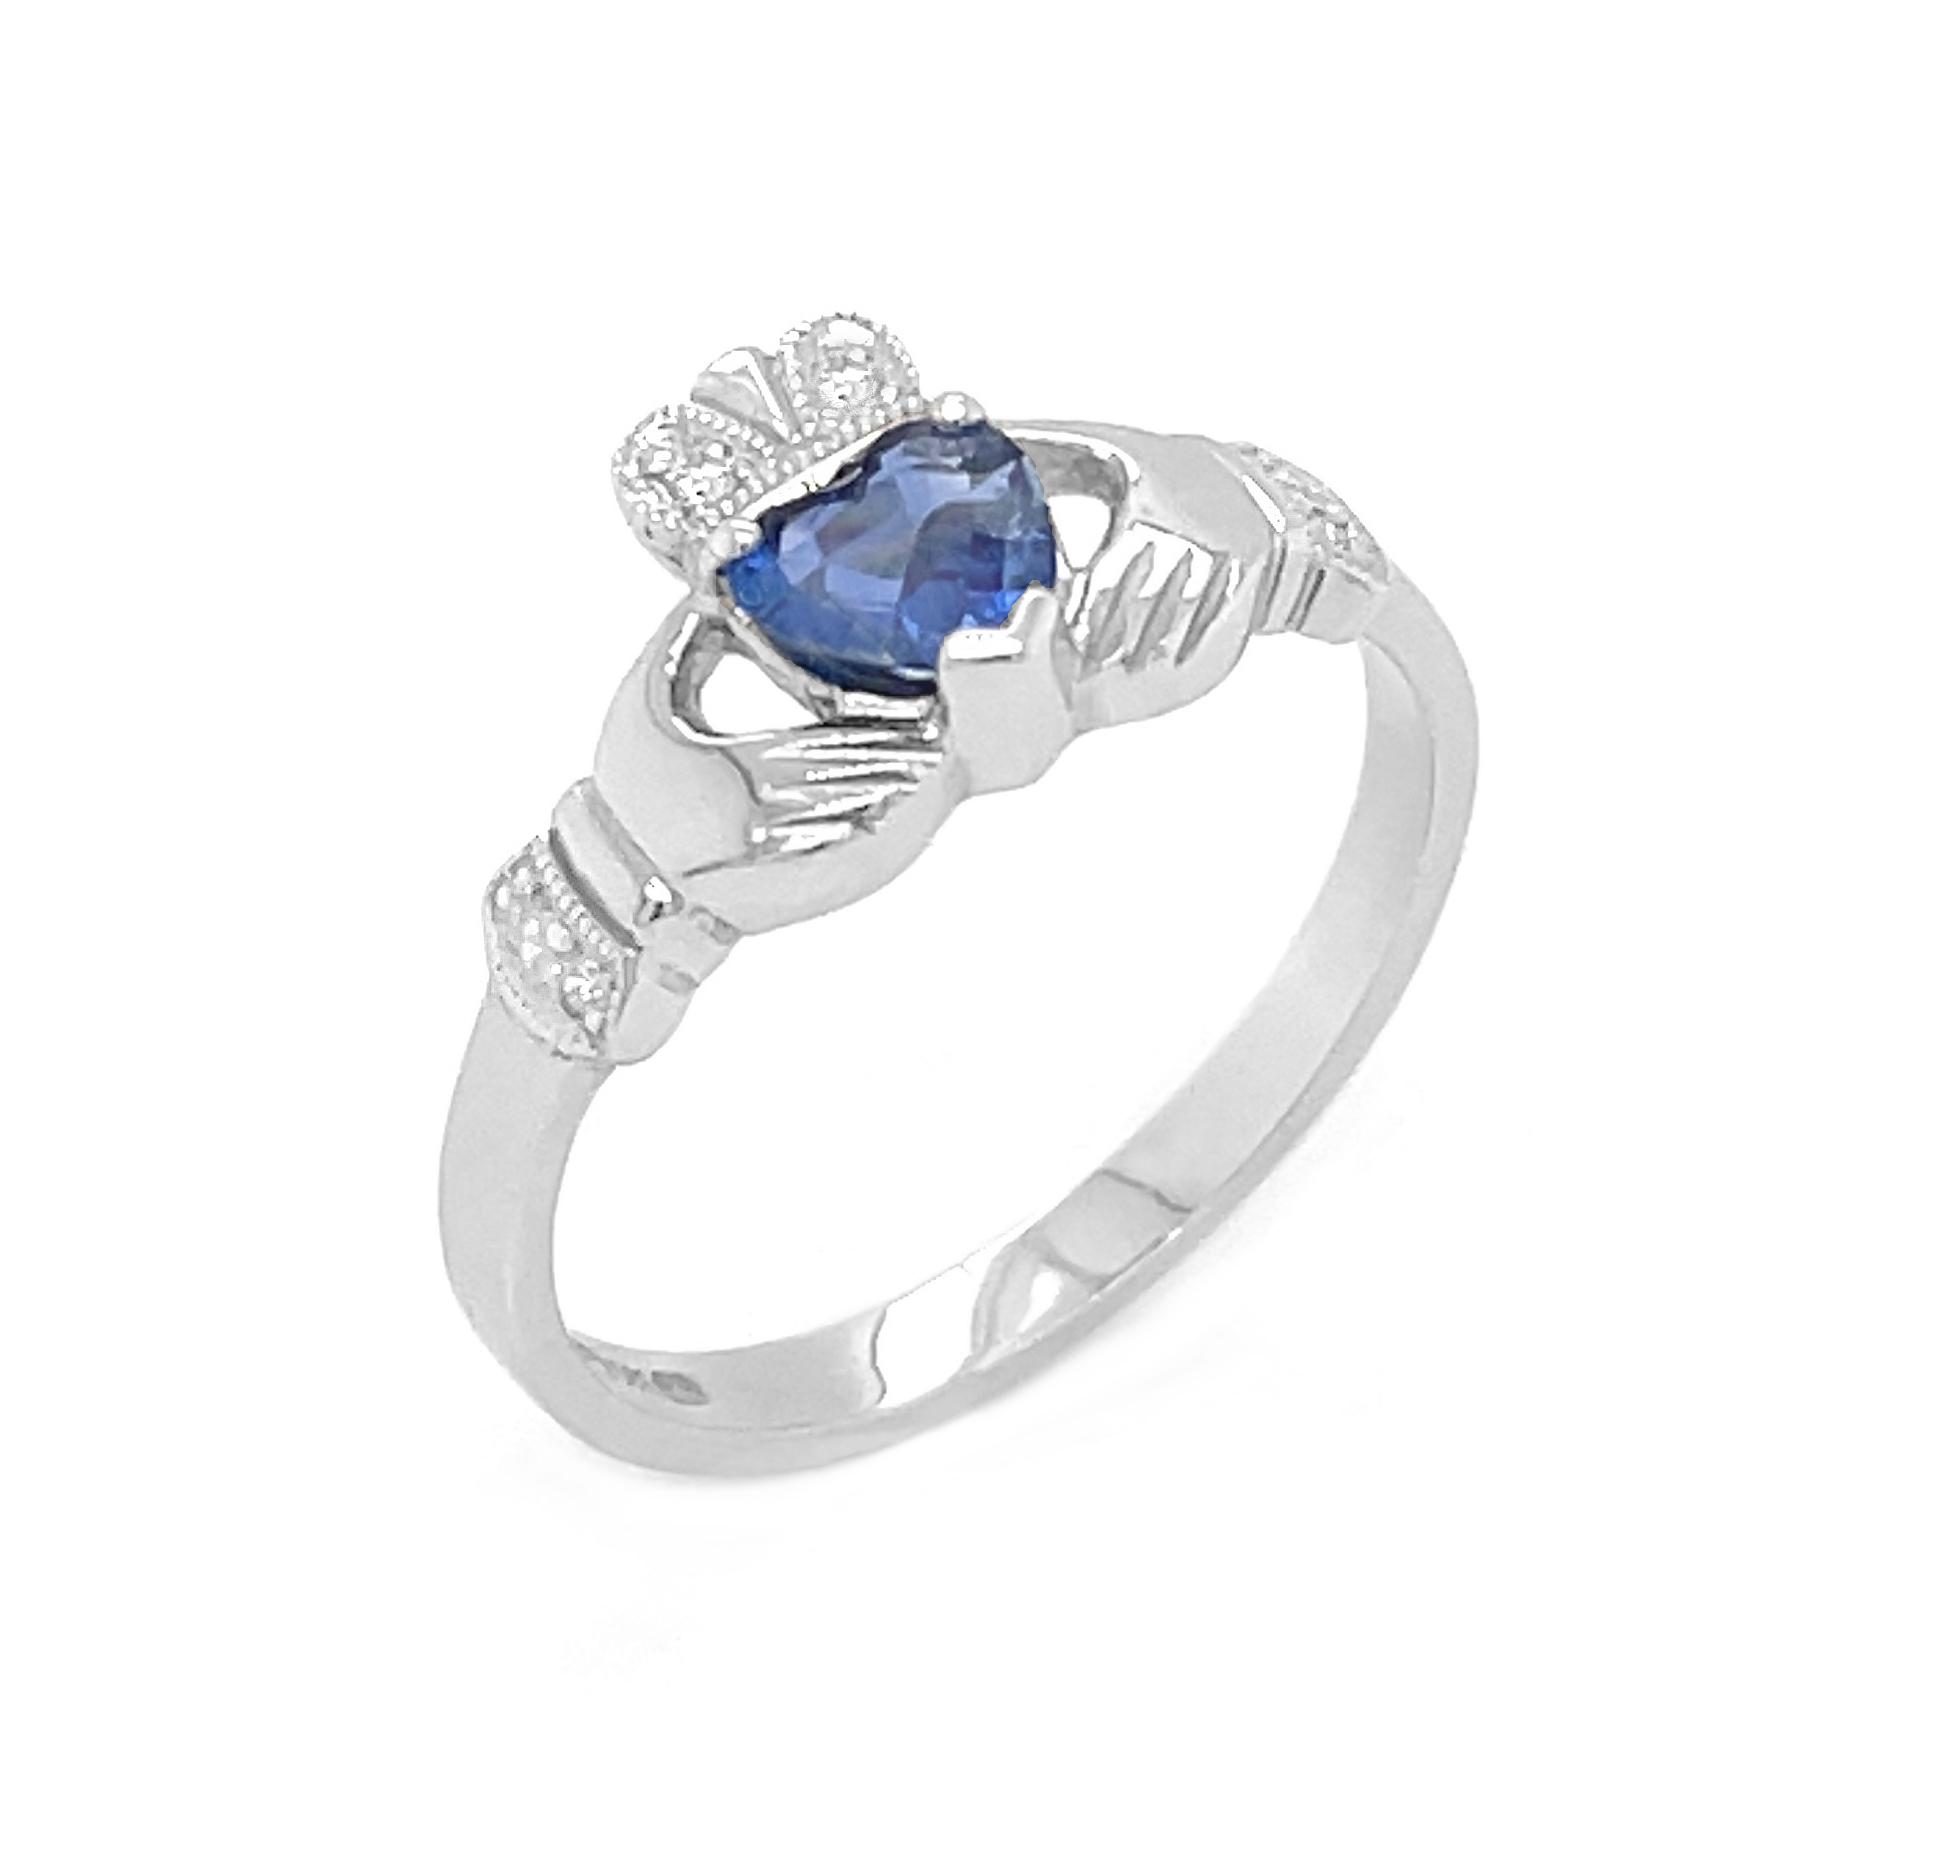 Heartshape Sapphire And Diamond Claddagh Ring